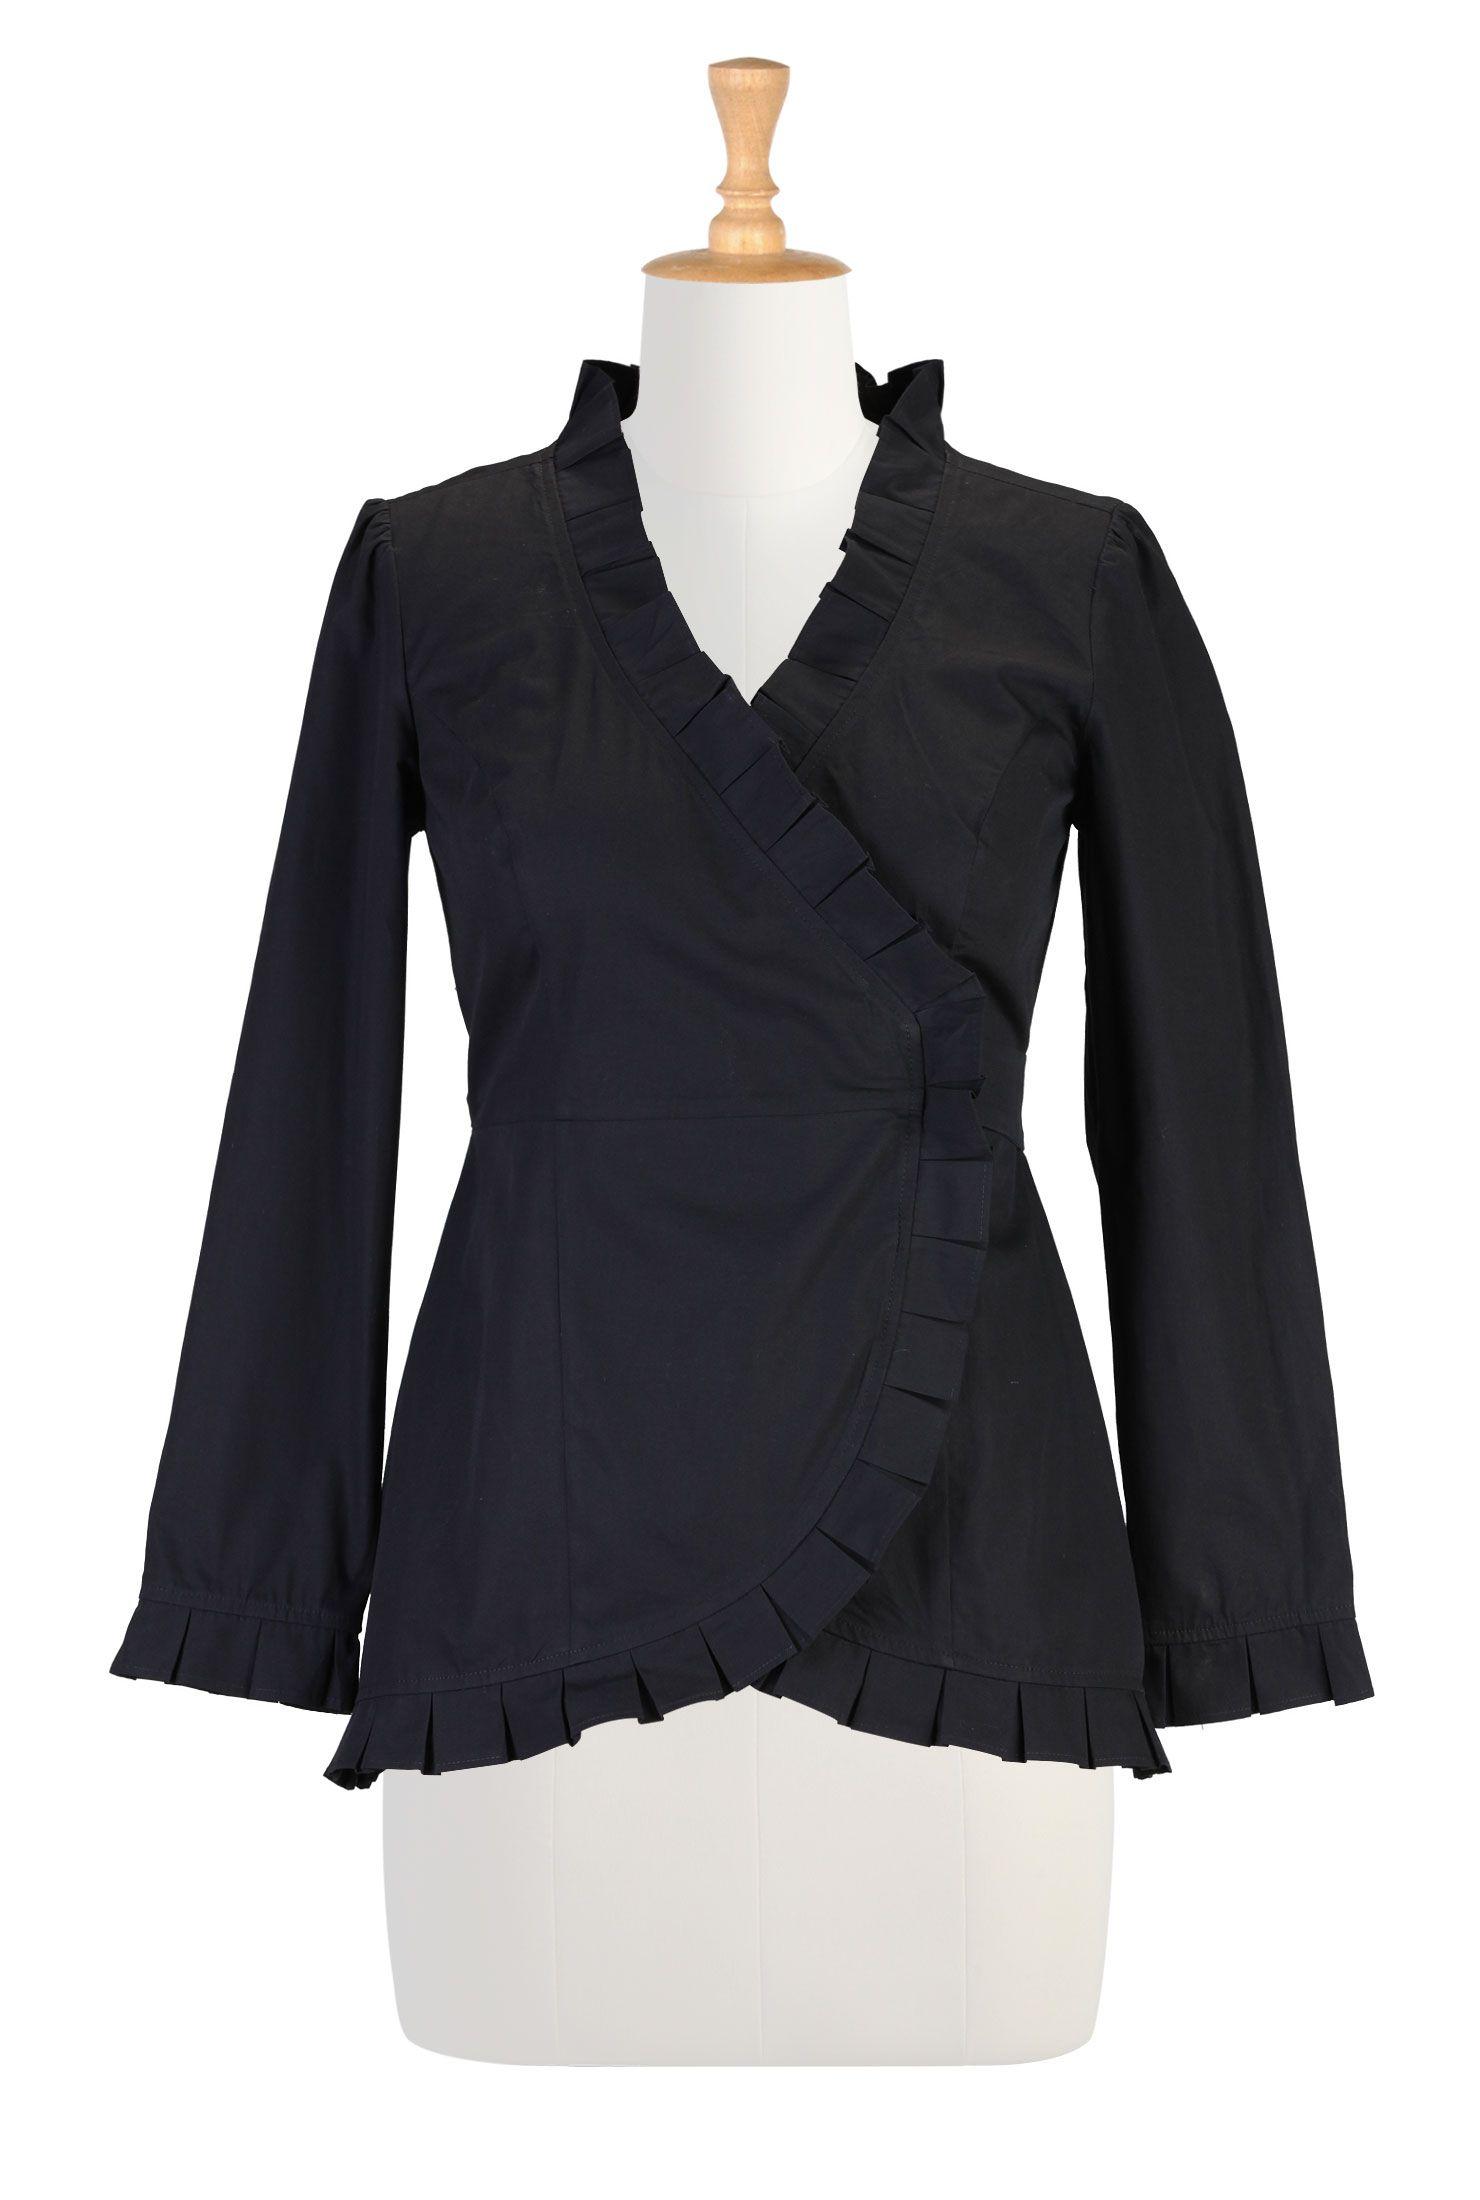 af967b7b66c Womens designer fashion - Tunic Tops - Shop for Tunic Tops